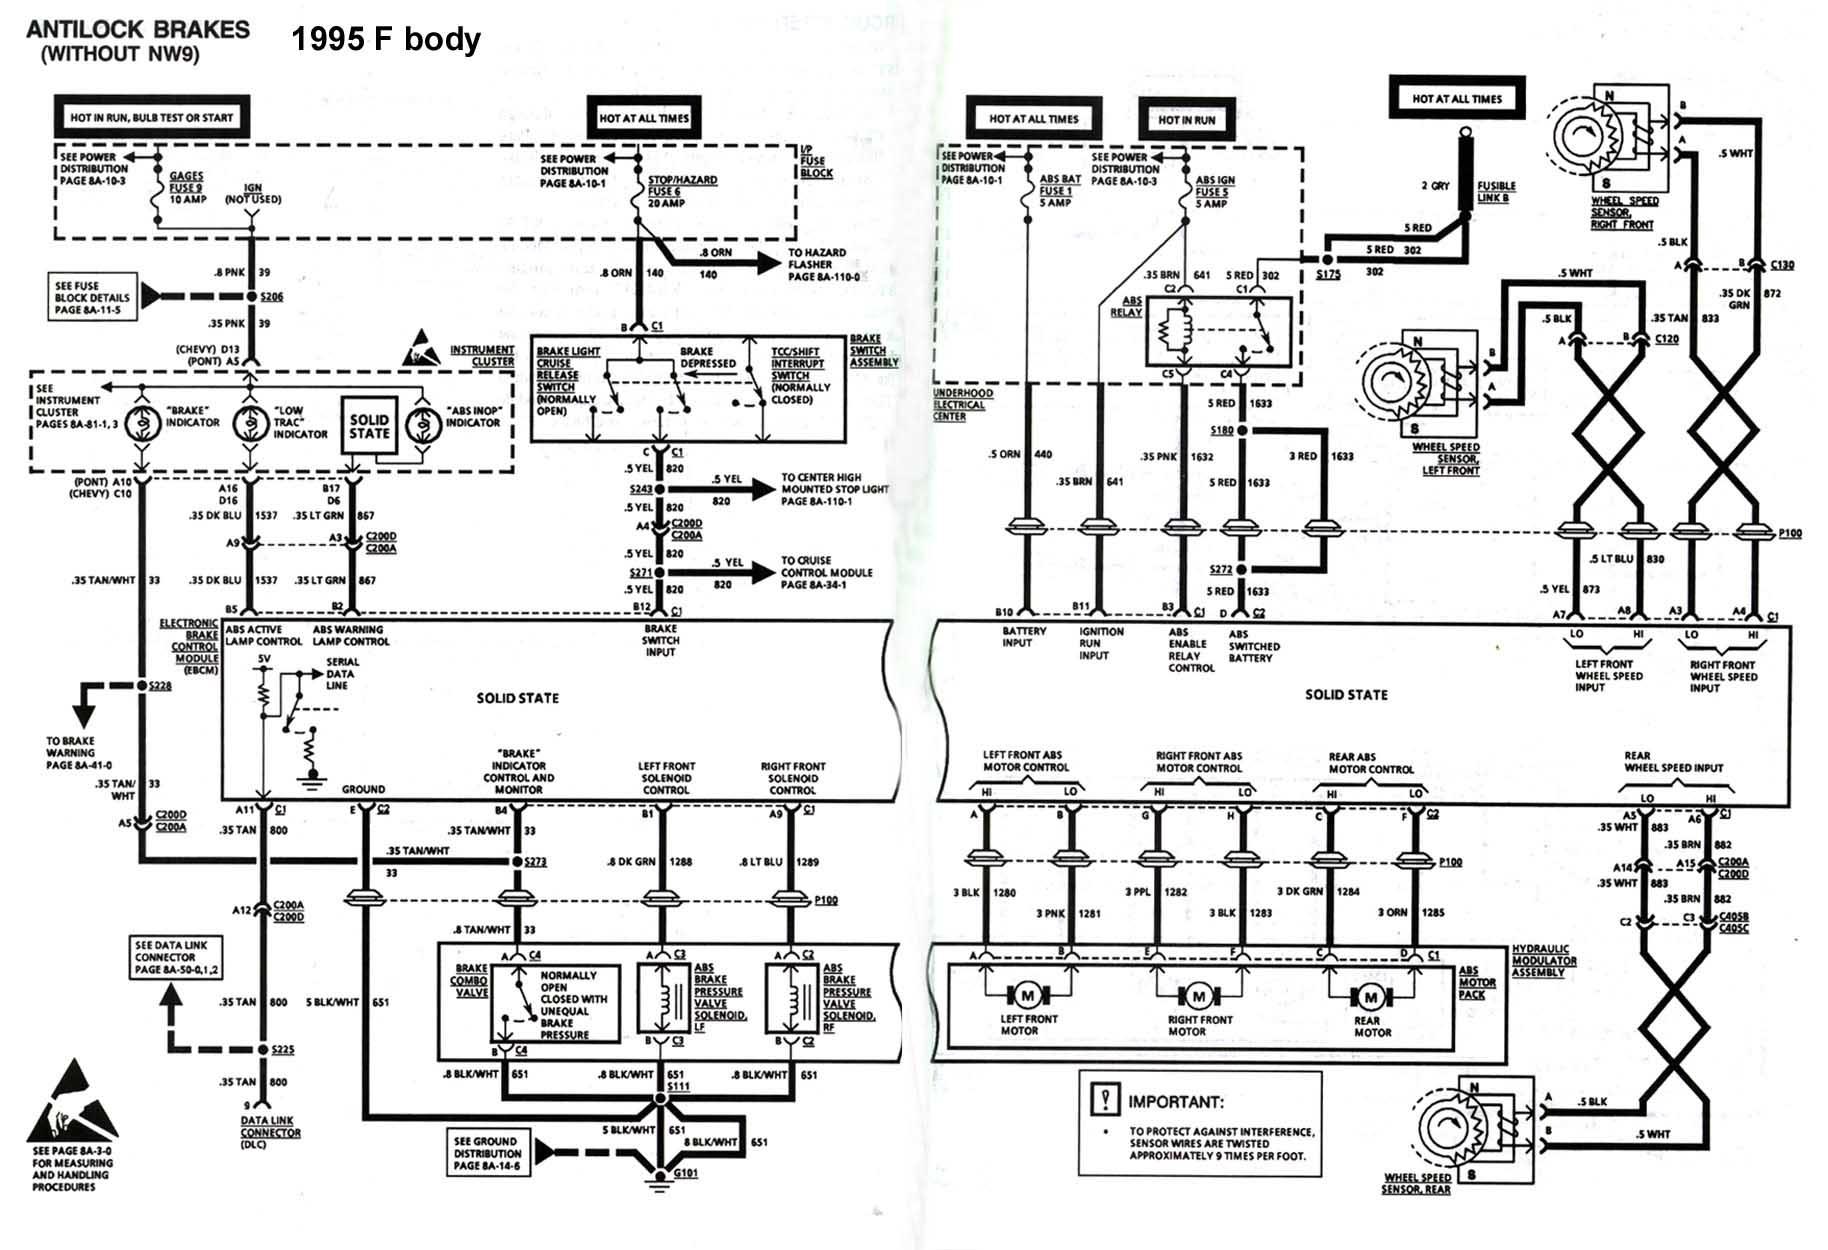 4Th Gen Lt1 F-Body Tech Aids - Two Way Switch Wiring Diagram